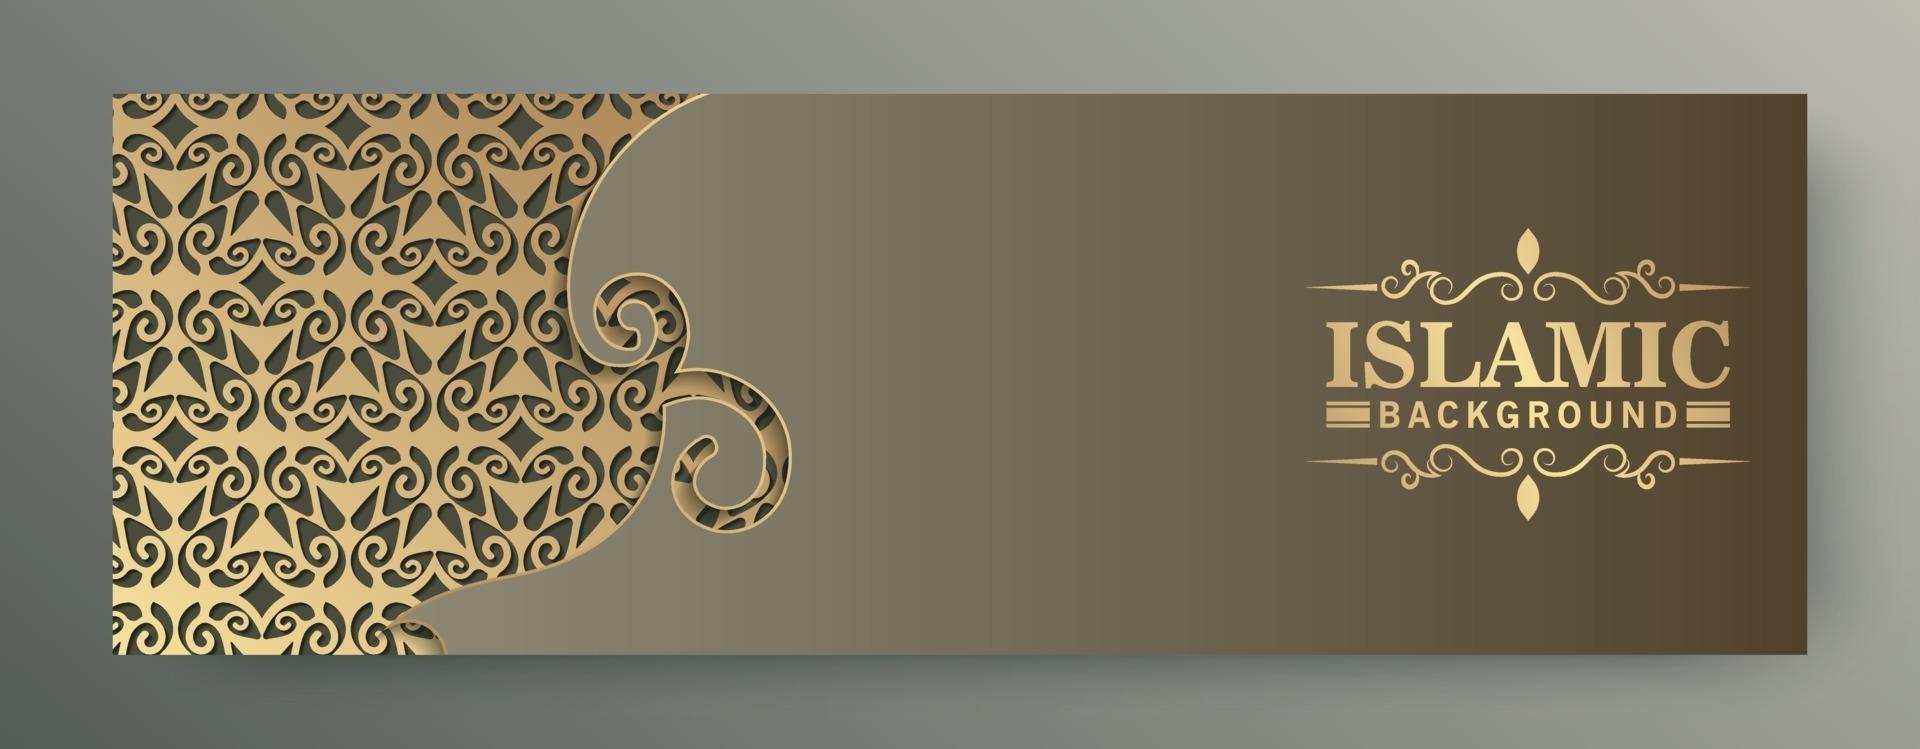 Premium-Menükarte Banner Vorlage Design vektor